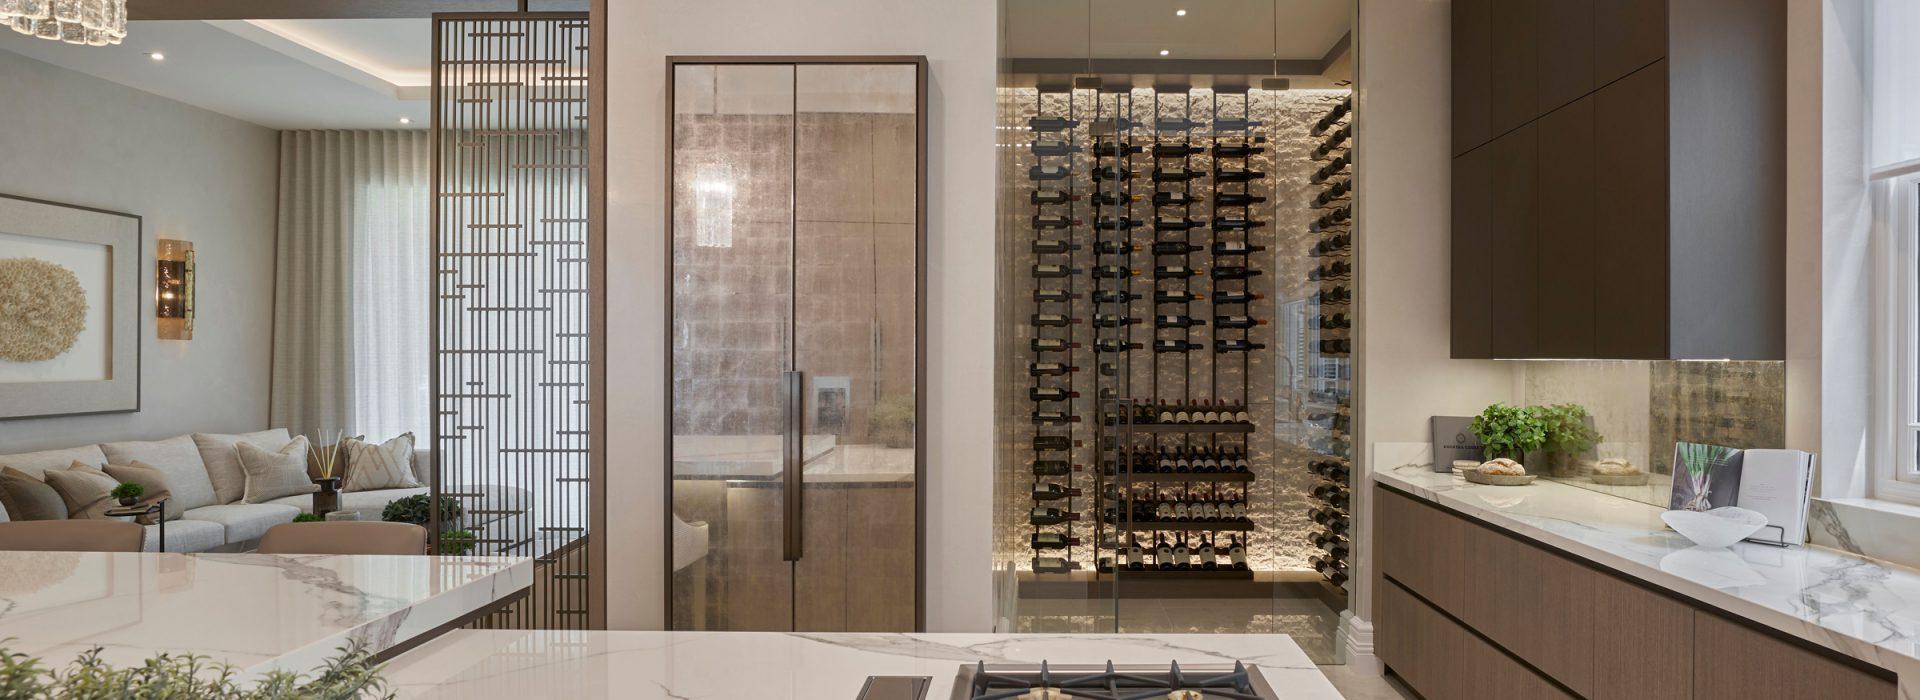 Luxury kitchen and wine room